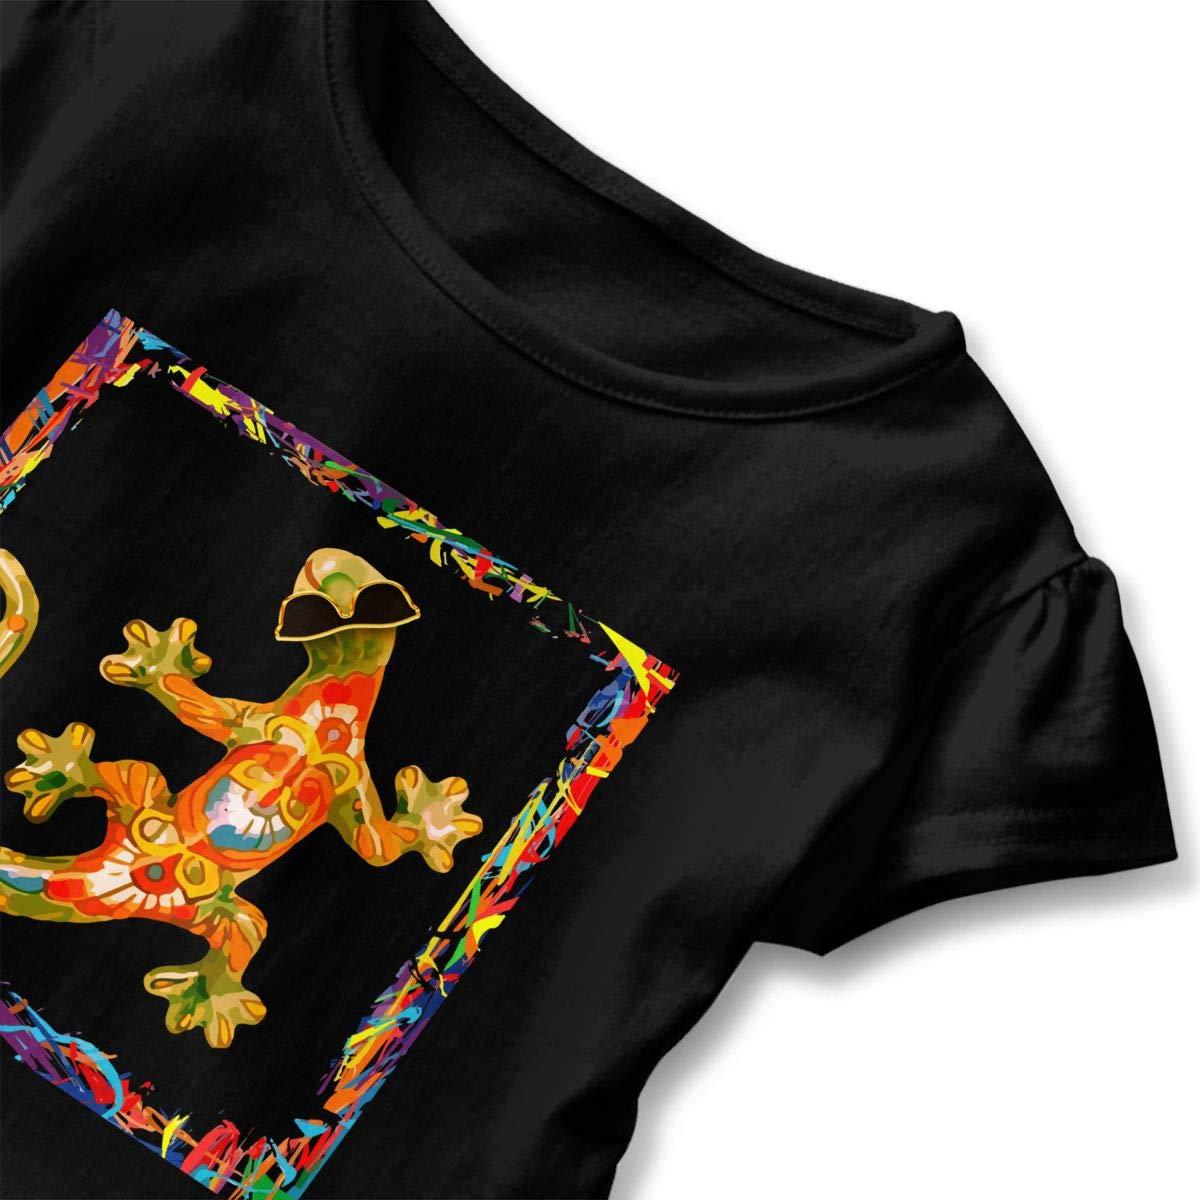 Hipster Colored Gecko Cute Short Sleeve Clothes for Boy Girl Dress Cotton T-Shirt Unique Bodysuit Romper,One-Piece Jumpsuit